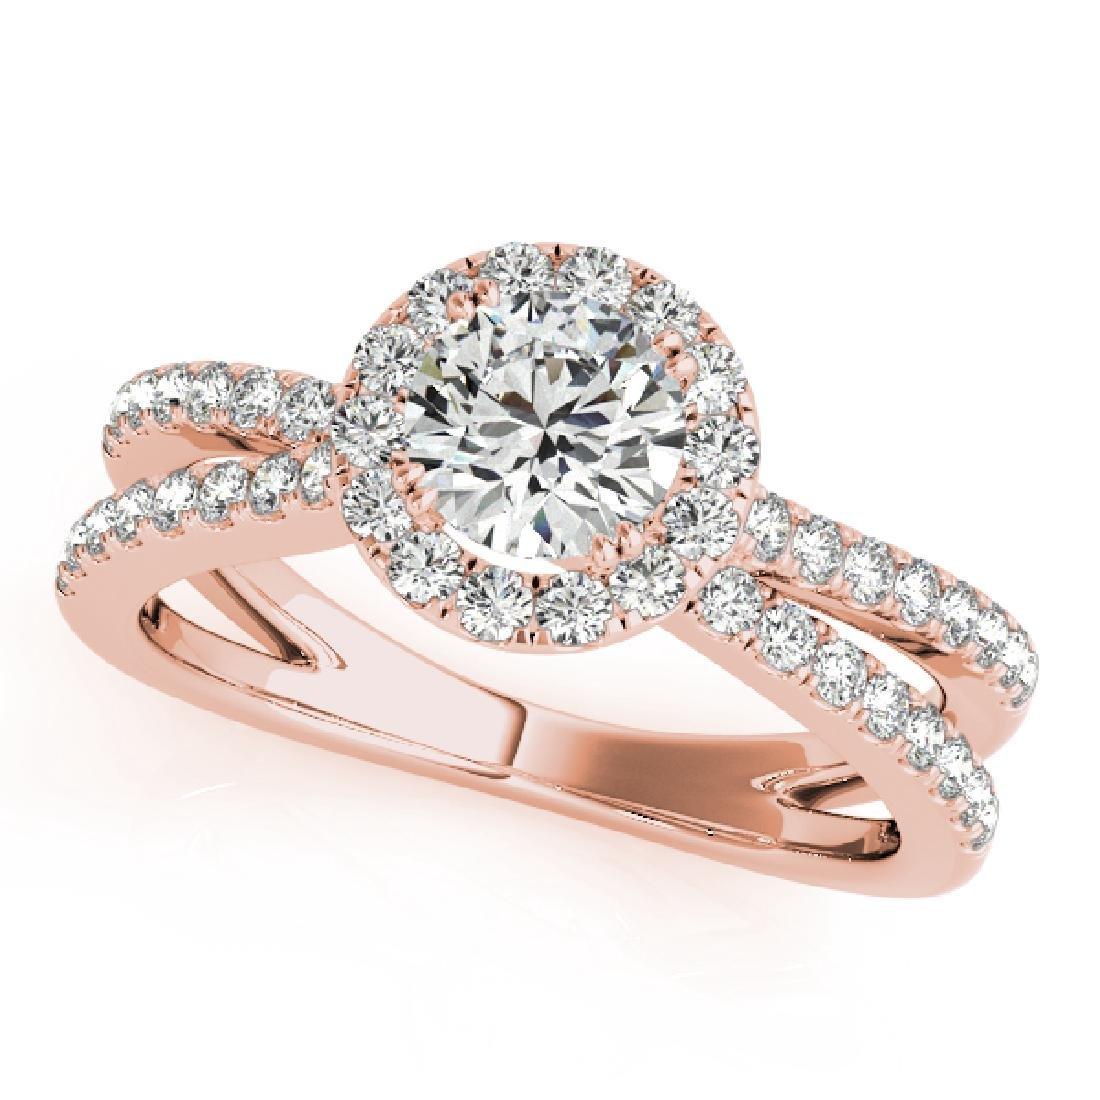 CERTIFIED 18K ROSE GOLD 1.15 CT G-H/VS-SI1 DIAMOND HALO